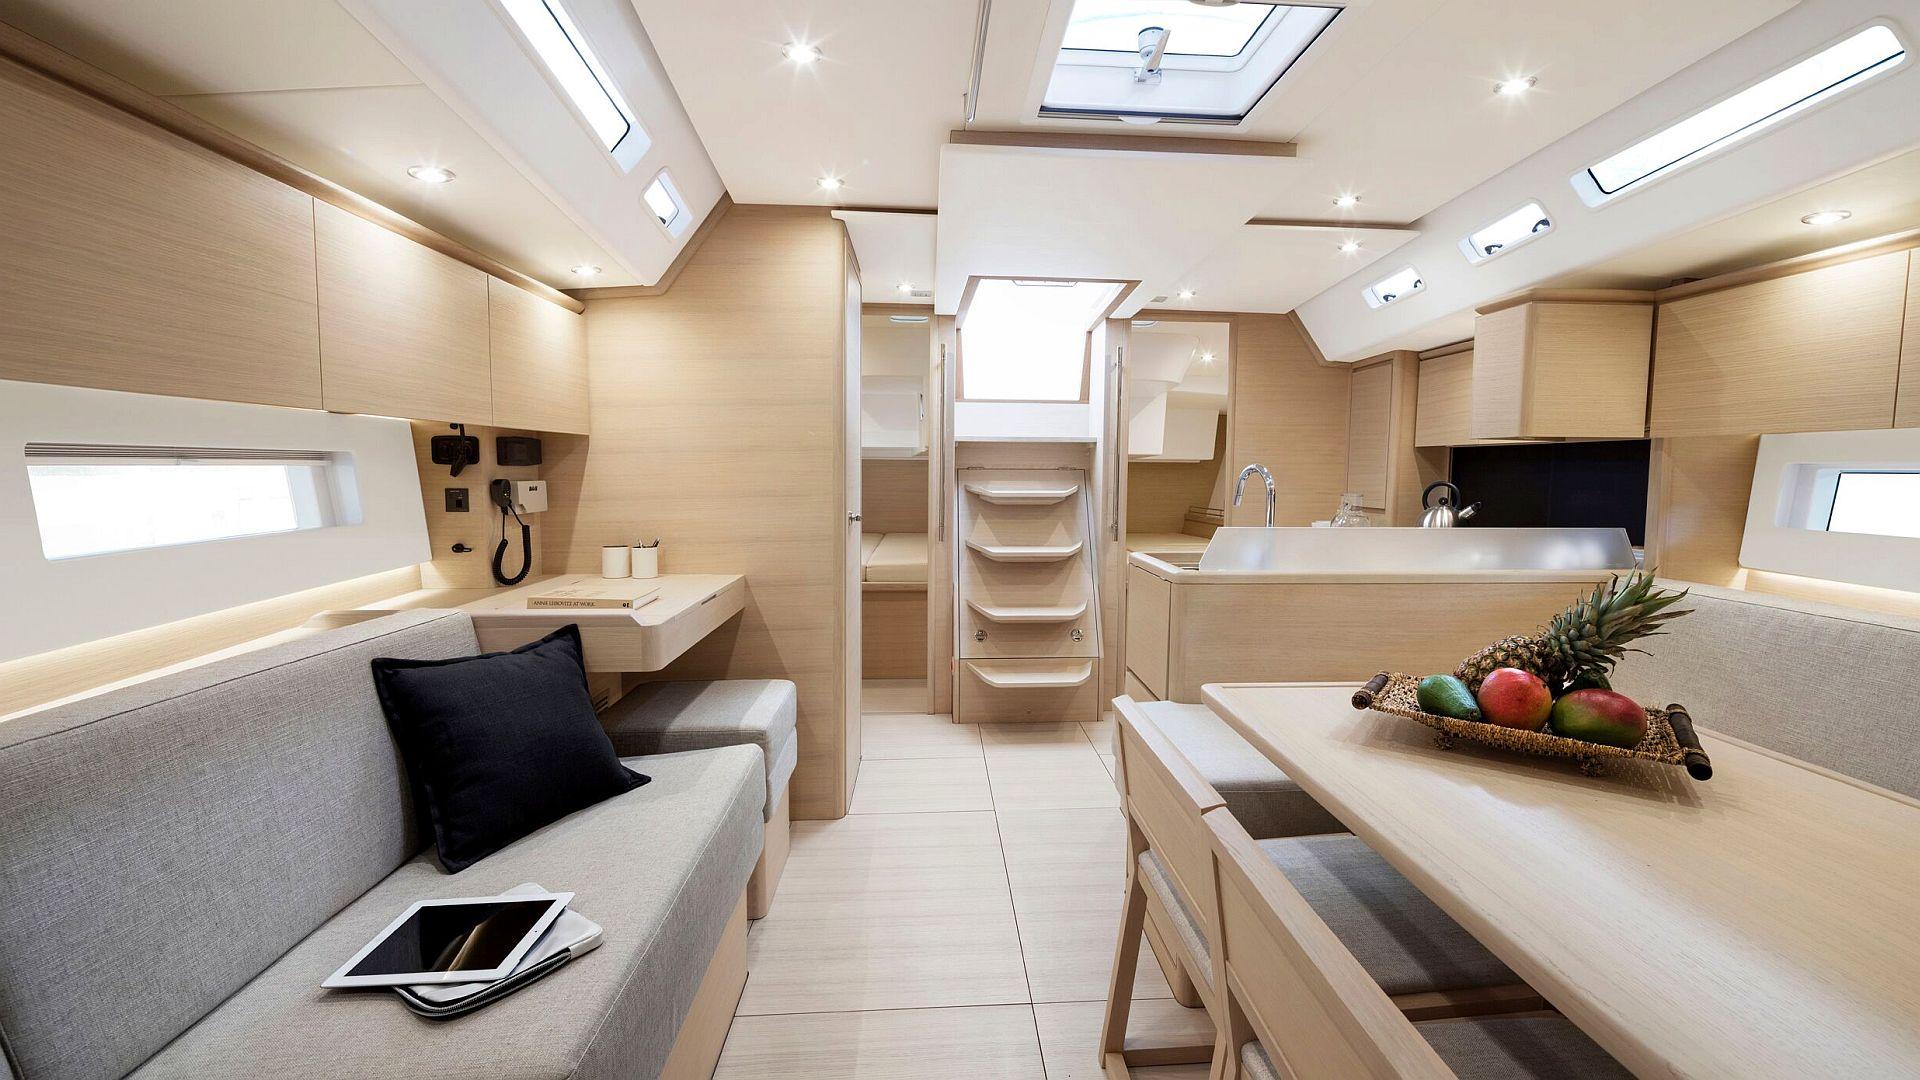 Solaris 47 | Moderner Performance-Cruiser aus Italien